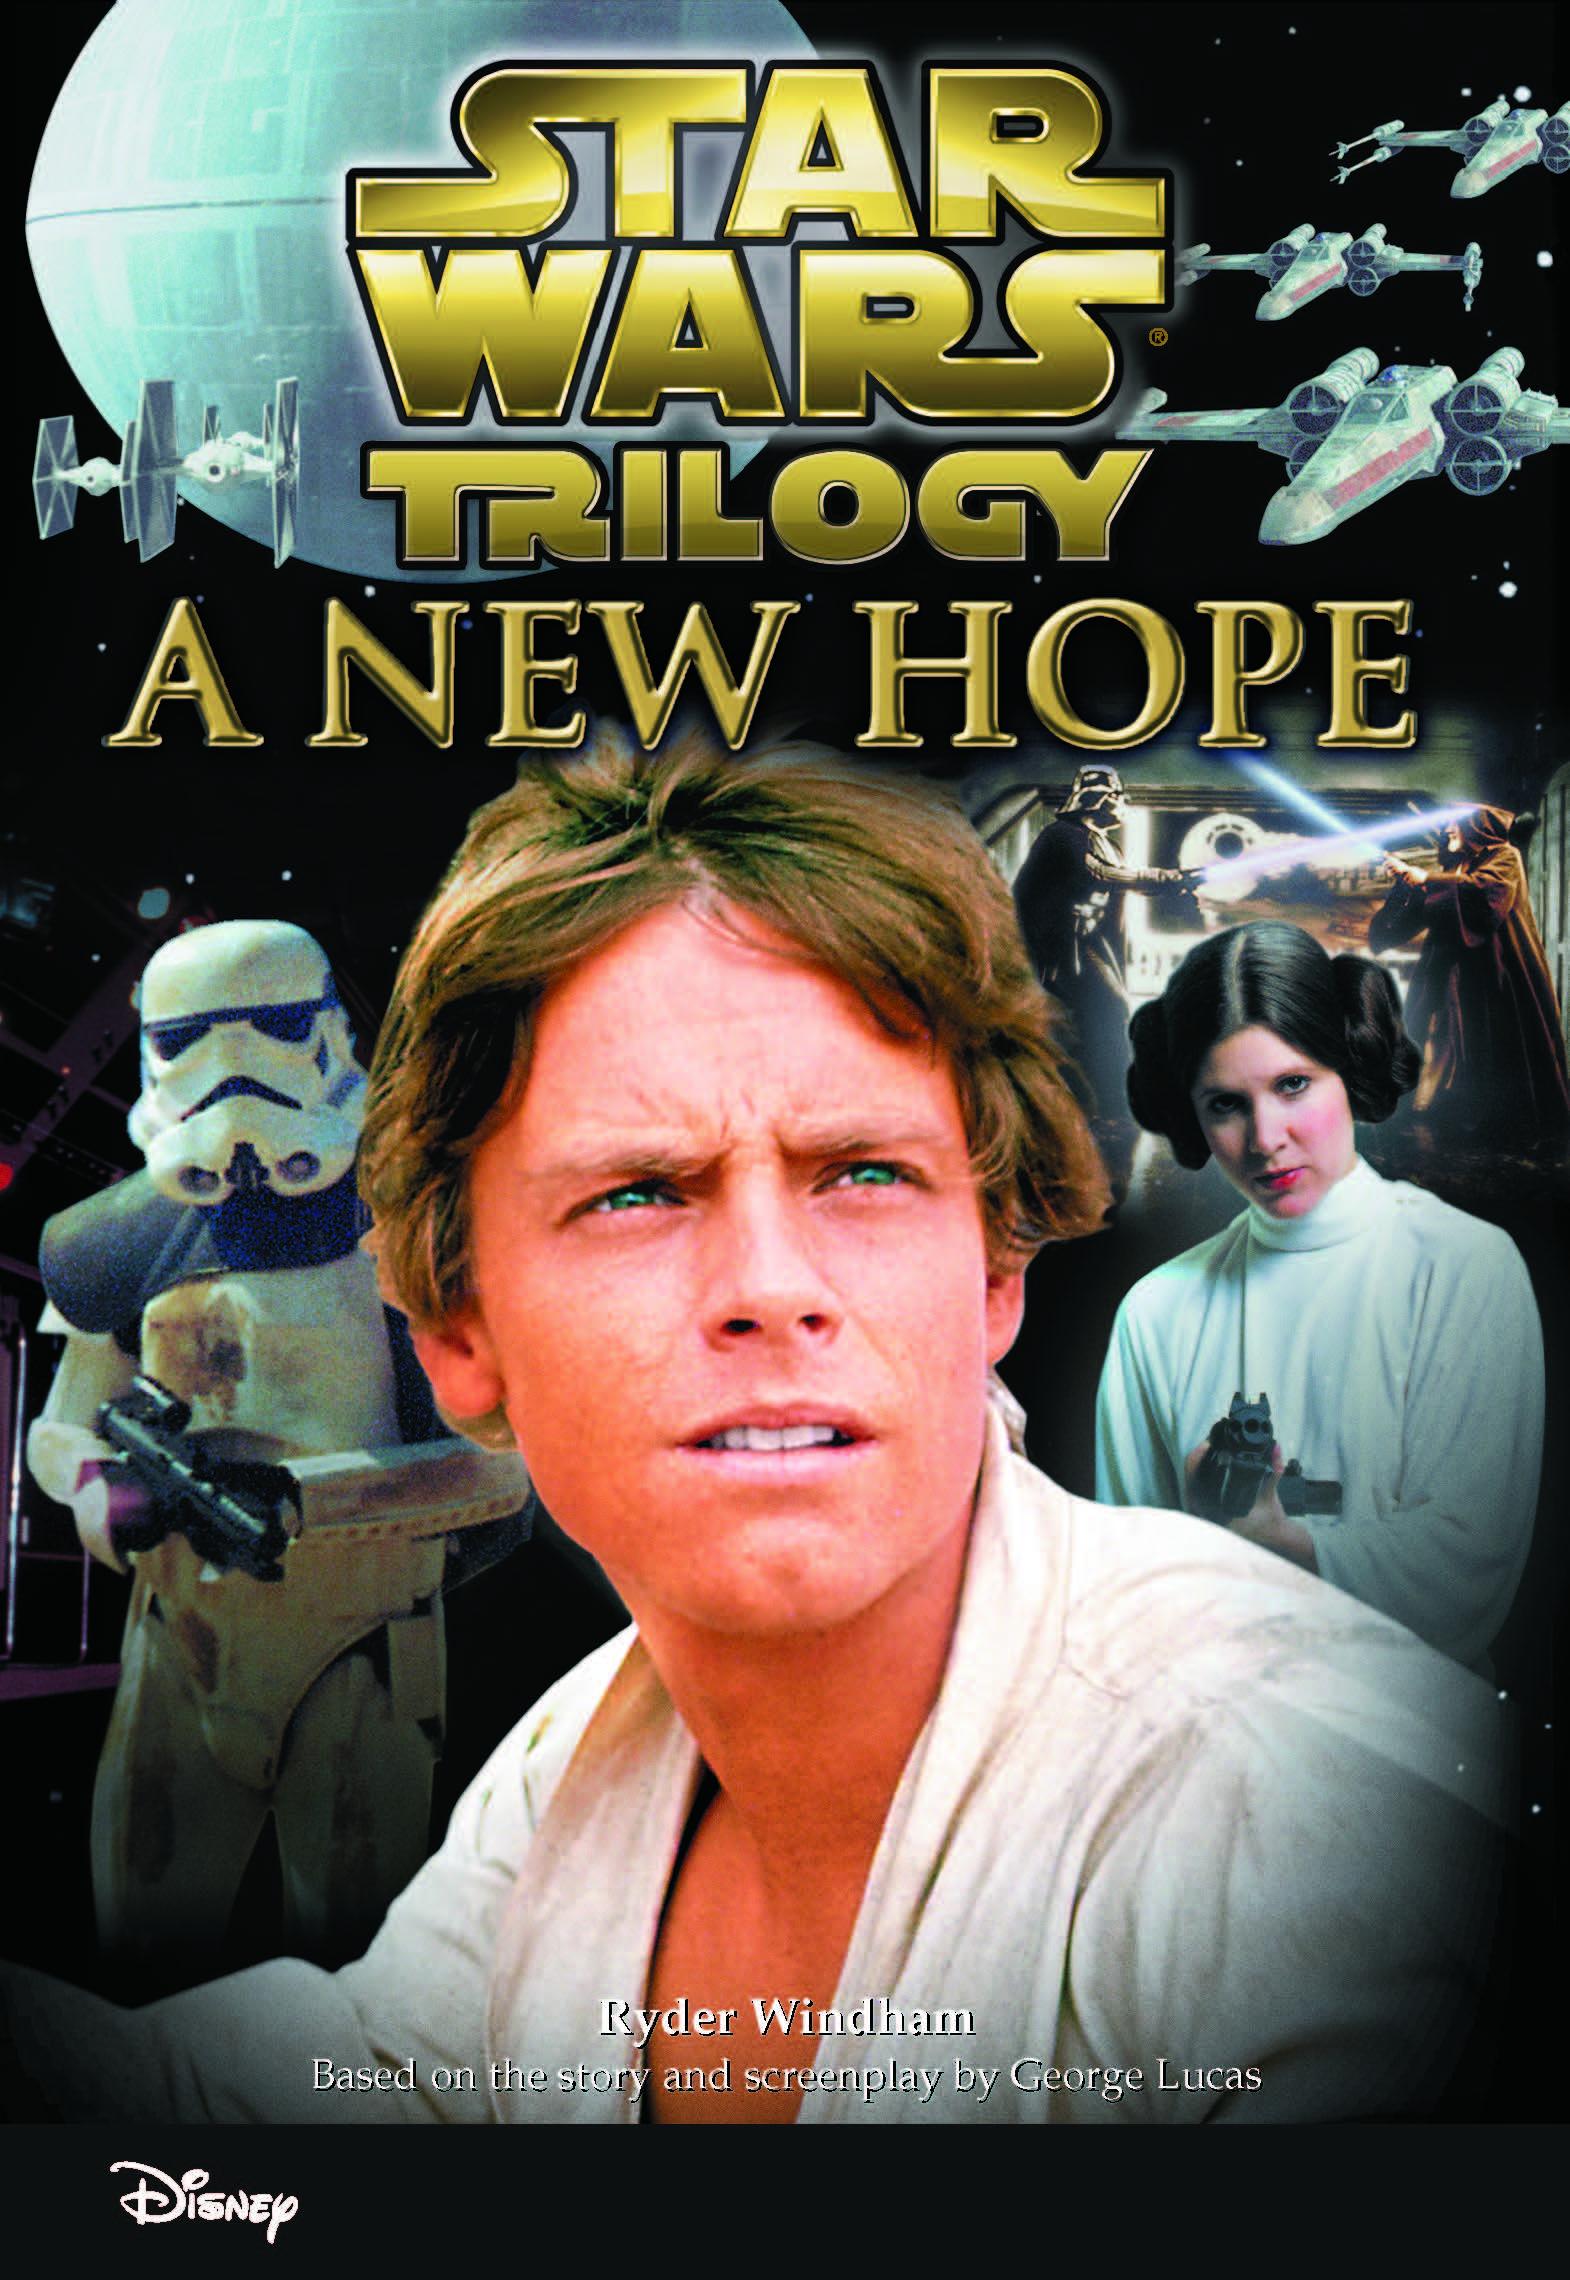 Star Wars Trilogy A New Hope Disney Books Disney Publishing Worldwide